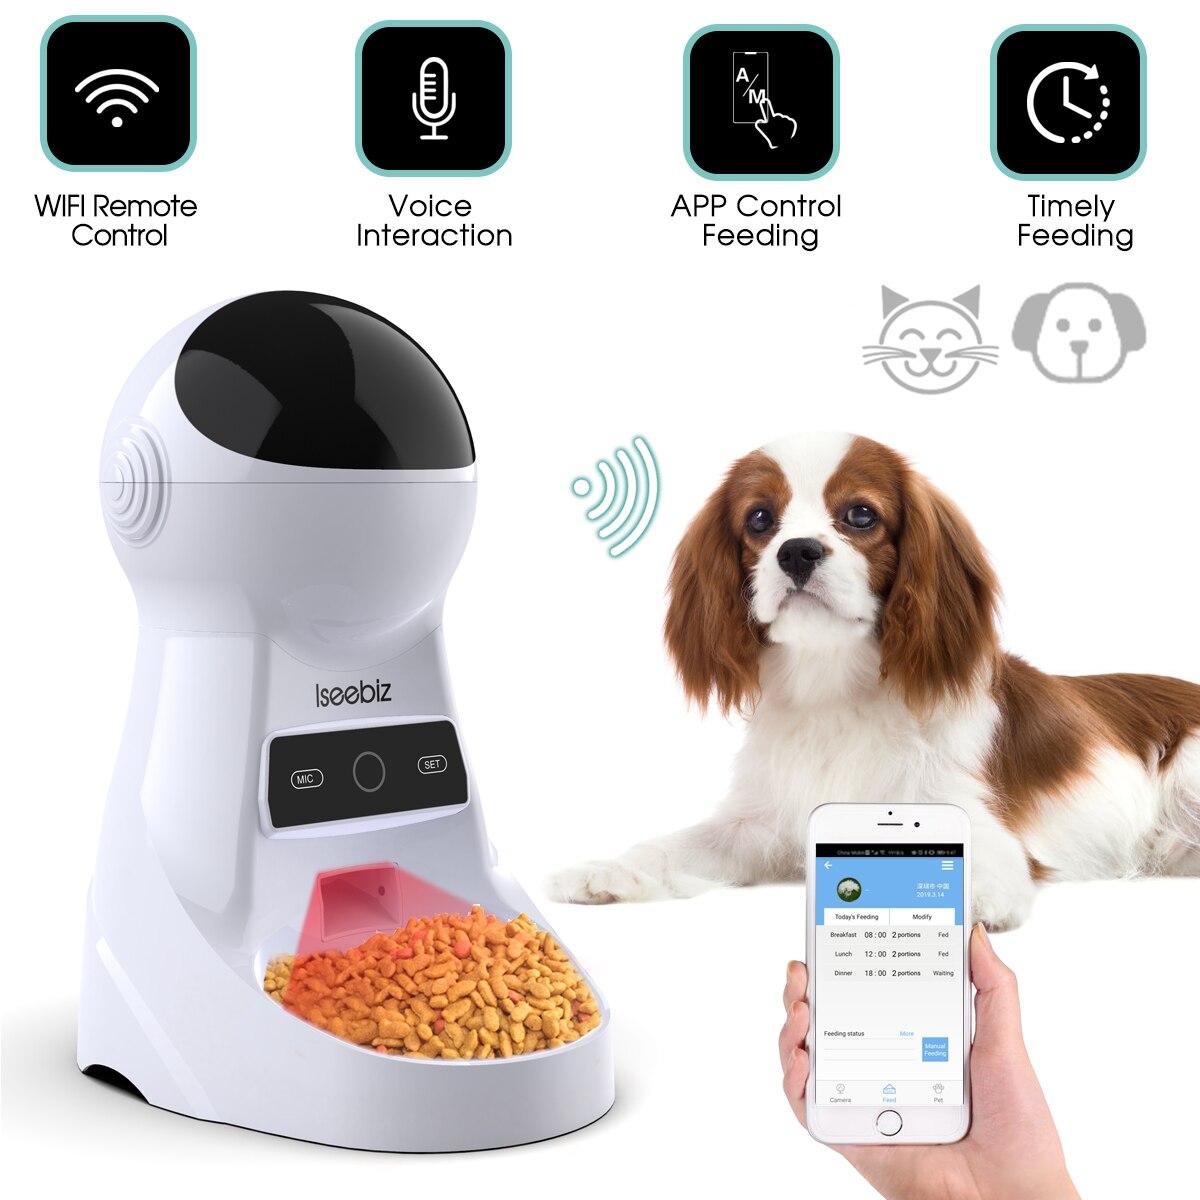 Iseebiz 3L Automatic Pet Feeder With Voice Record Pets food Bowl 17 » Pets Impress